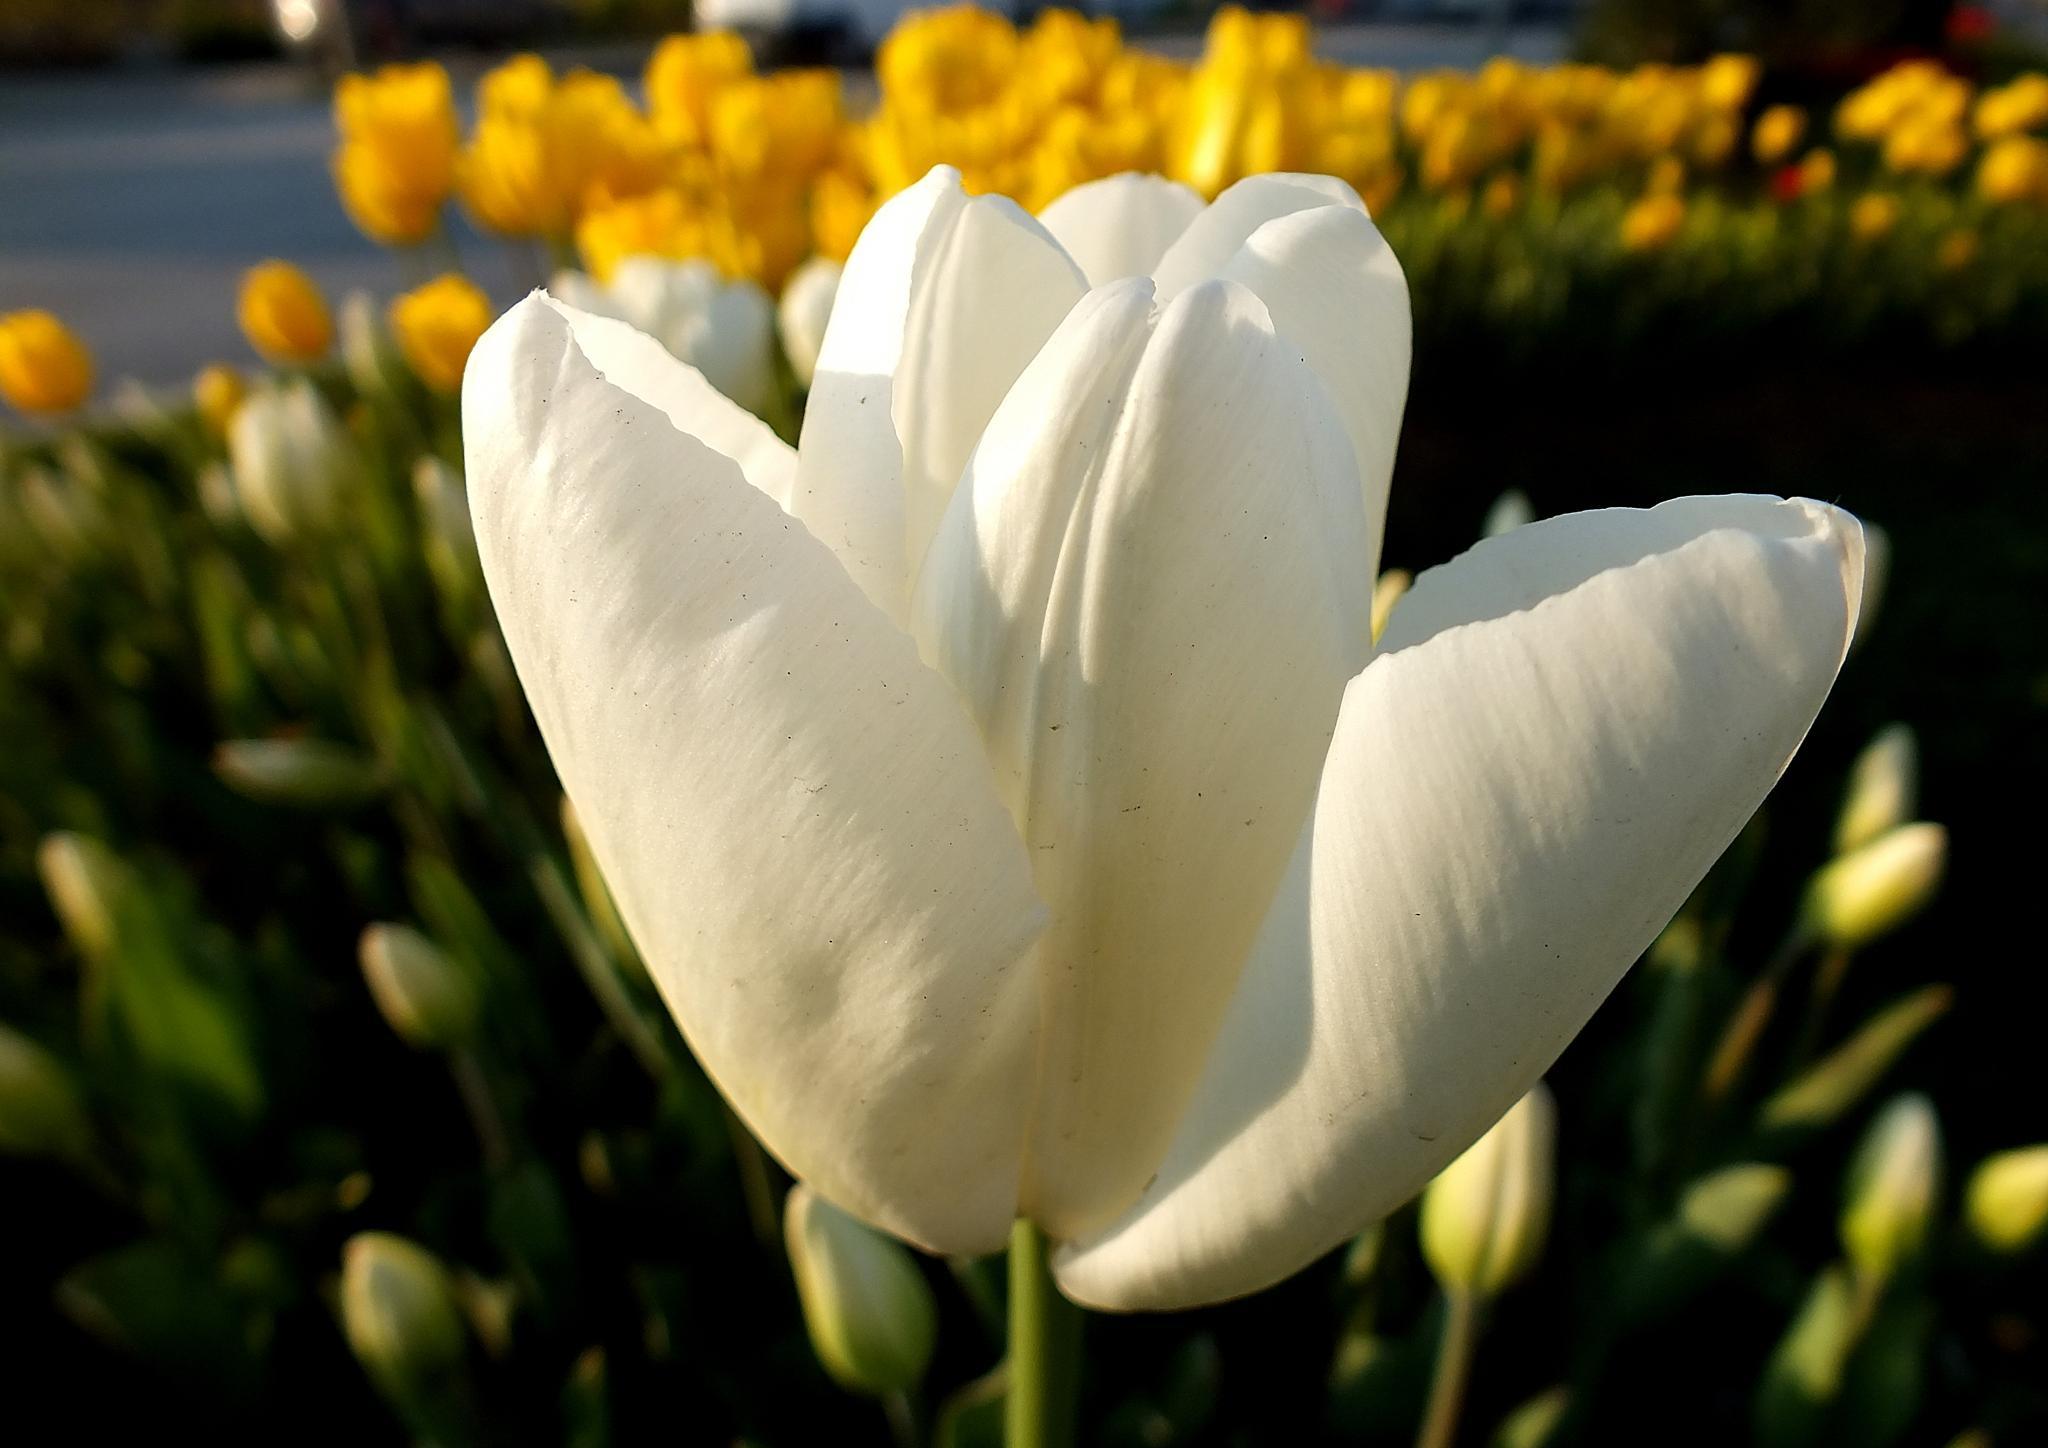 WHITE TULIP (BEYAZ LALE) by nedim alkan